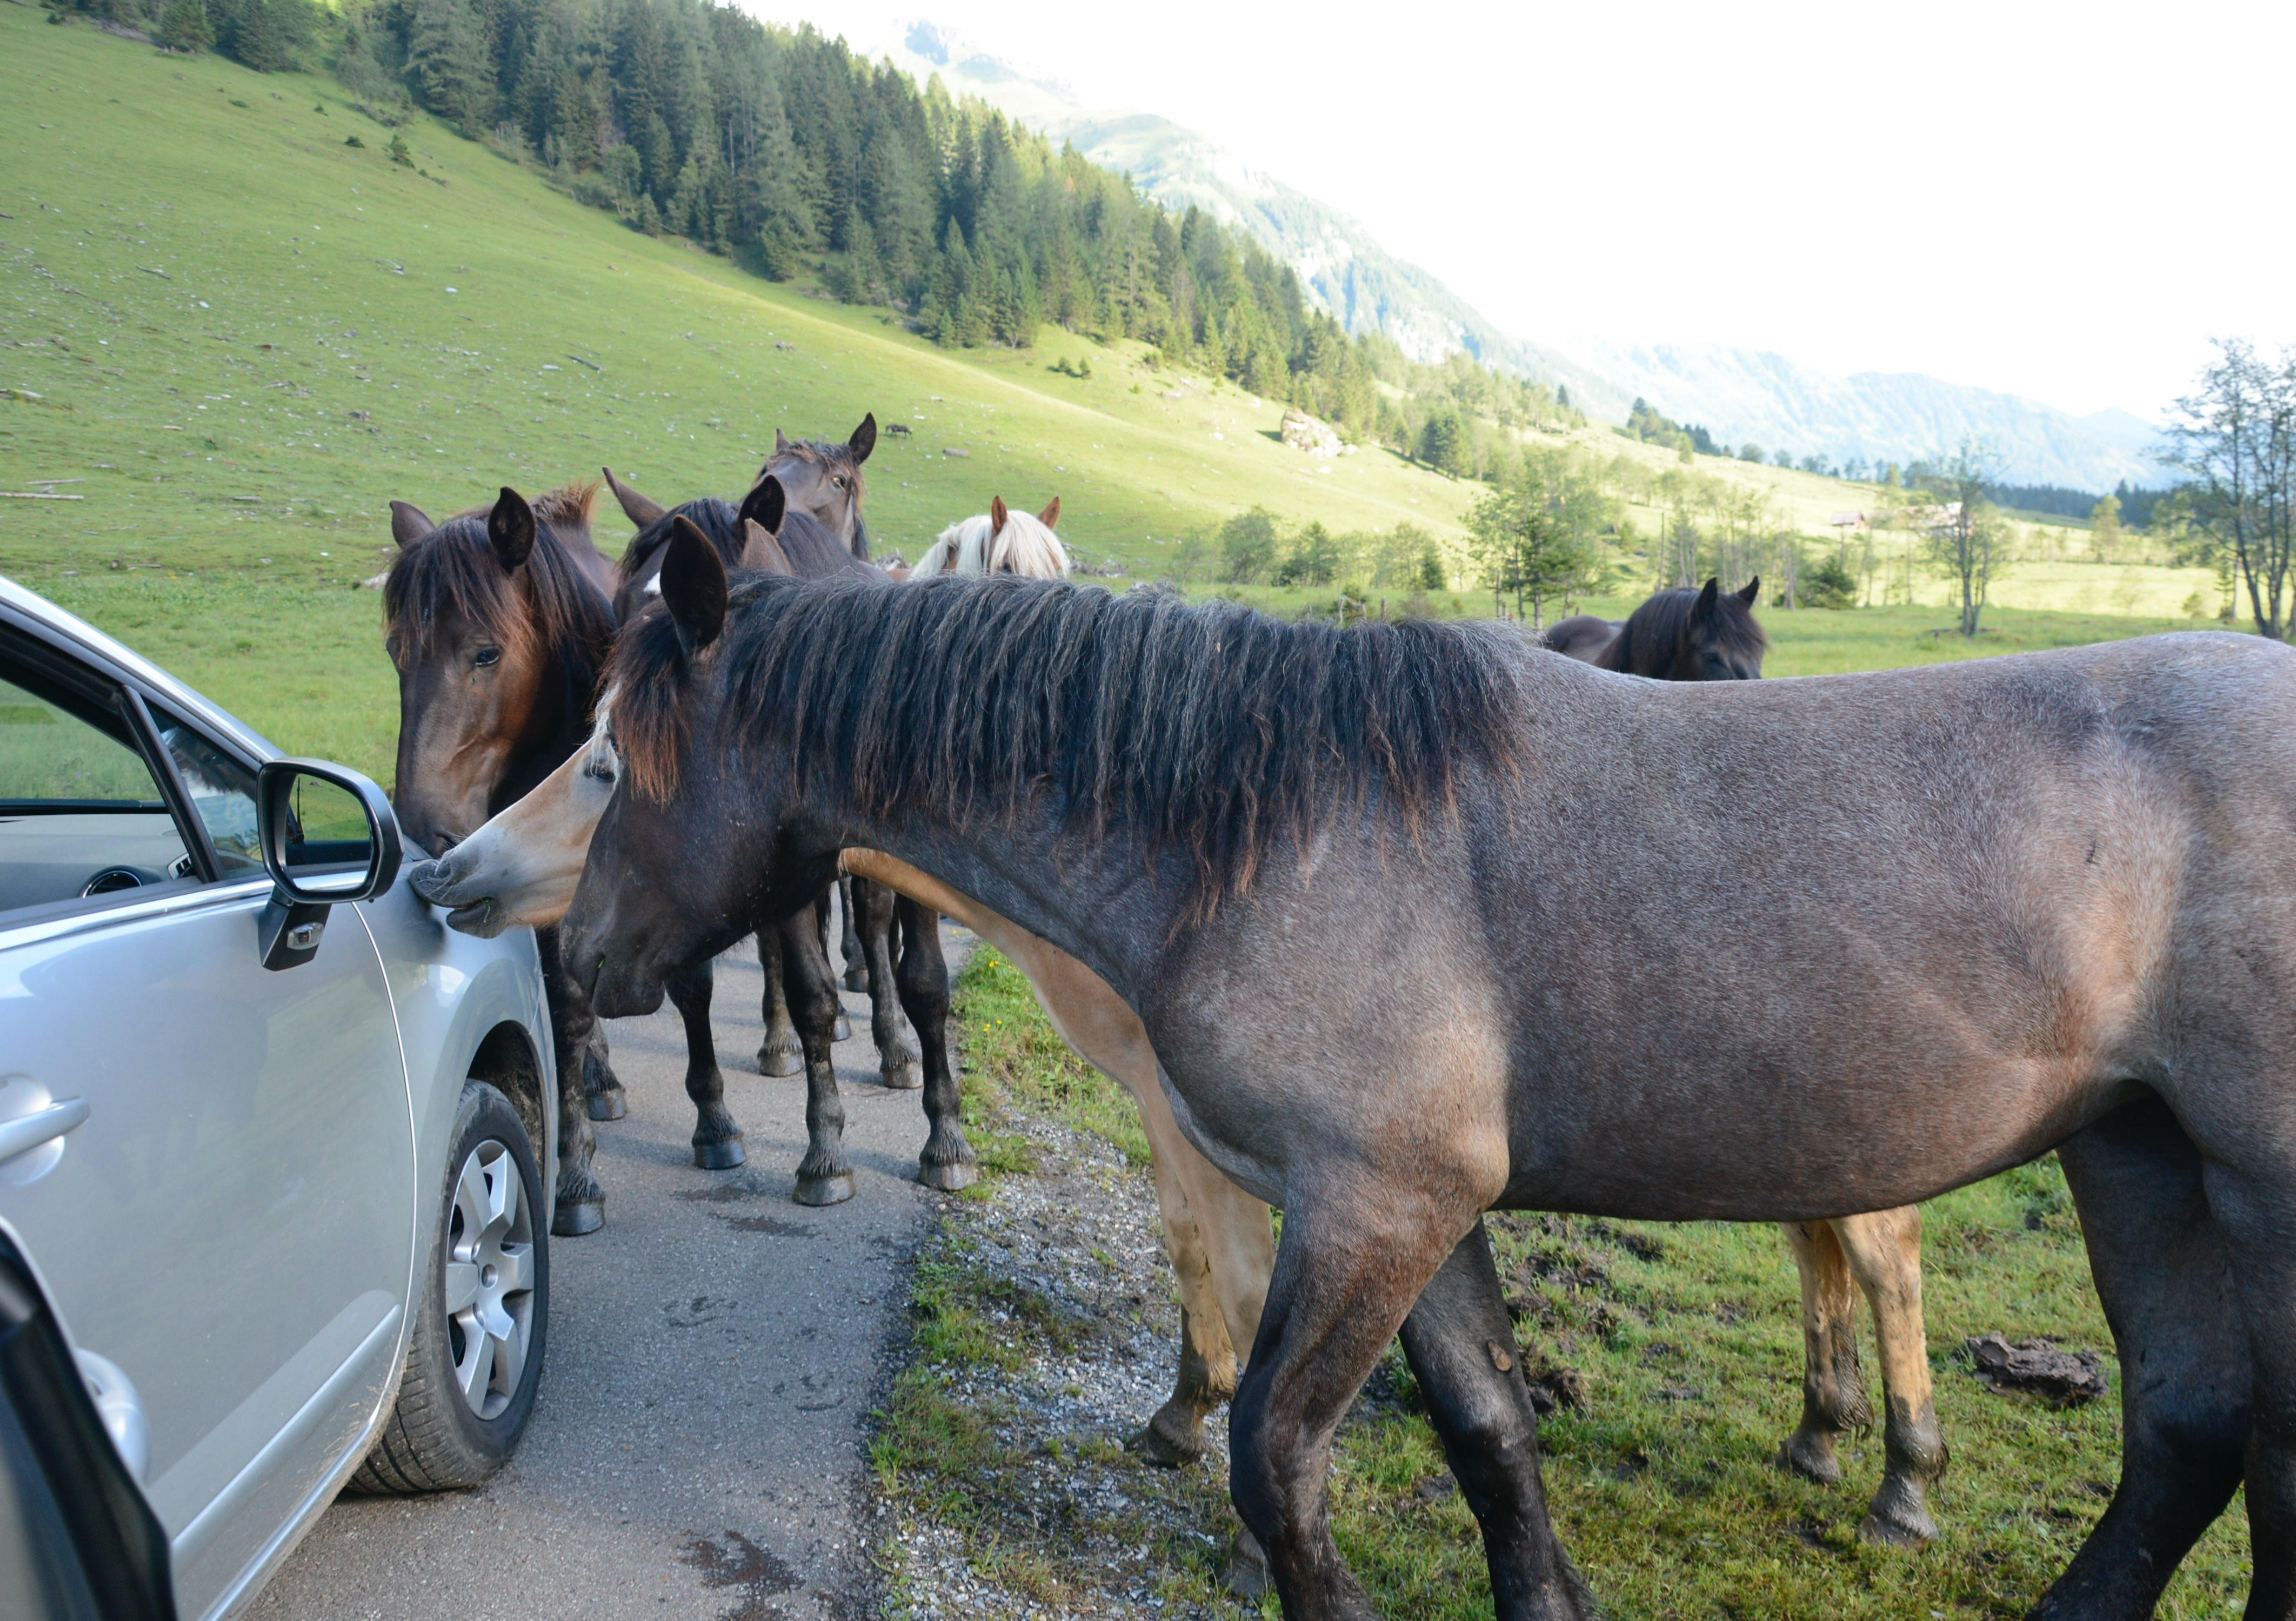 horses gathered around car